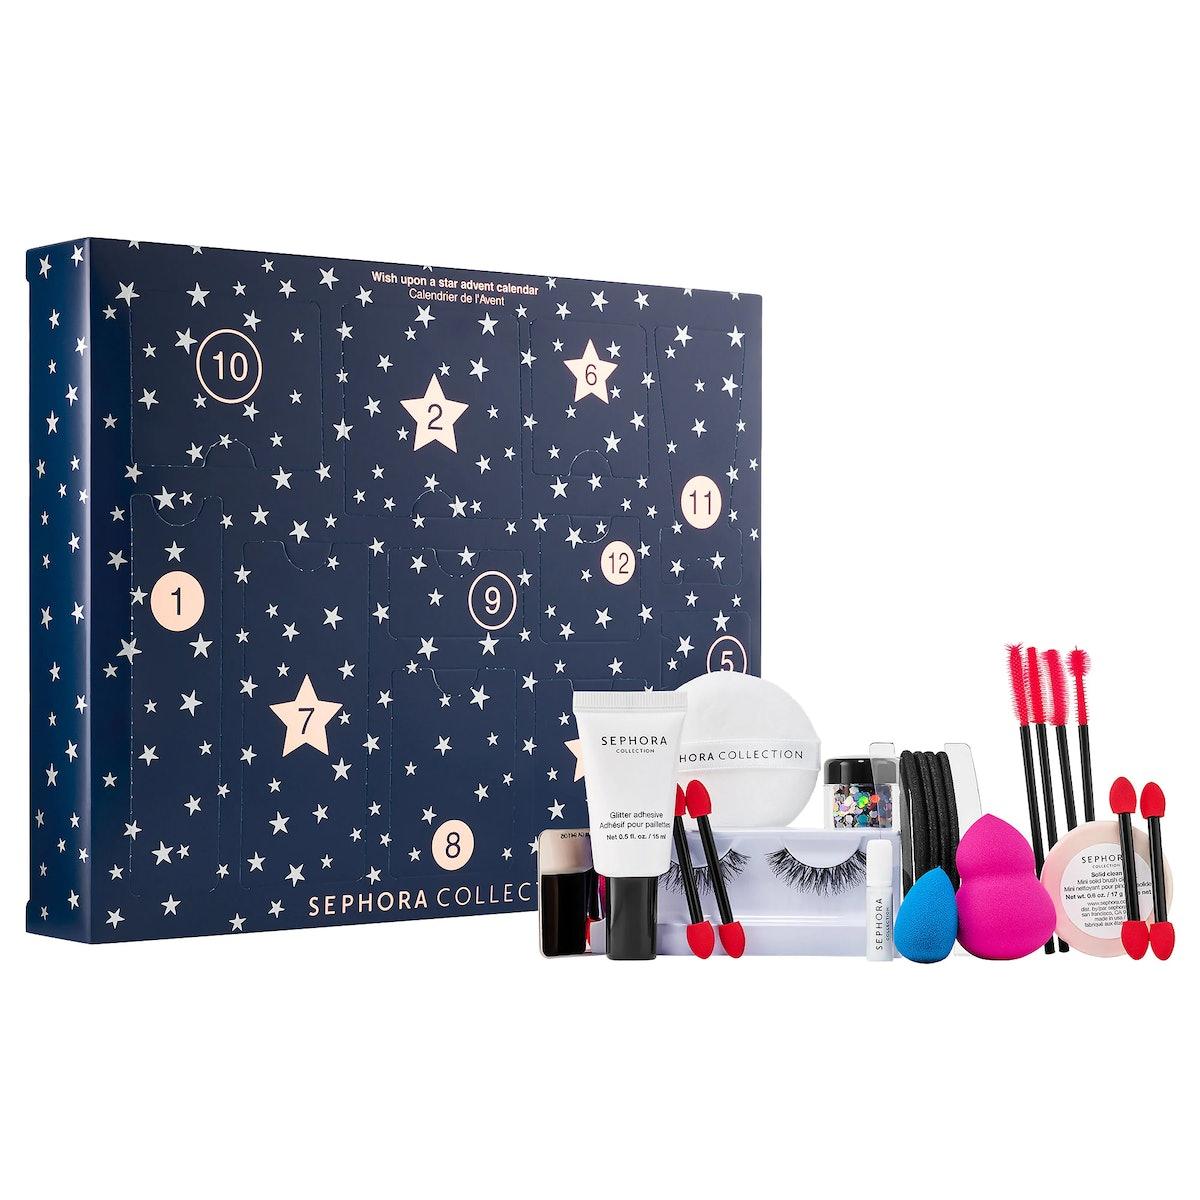 SEPHORA COLLECTION Wish Upon a Star Advent Calendar